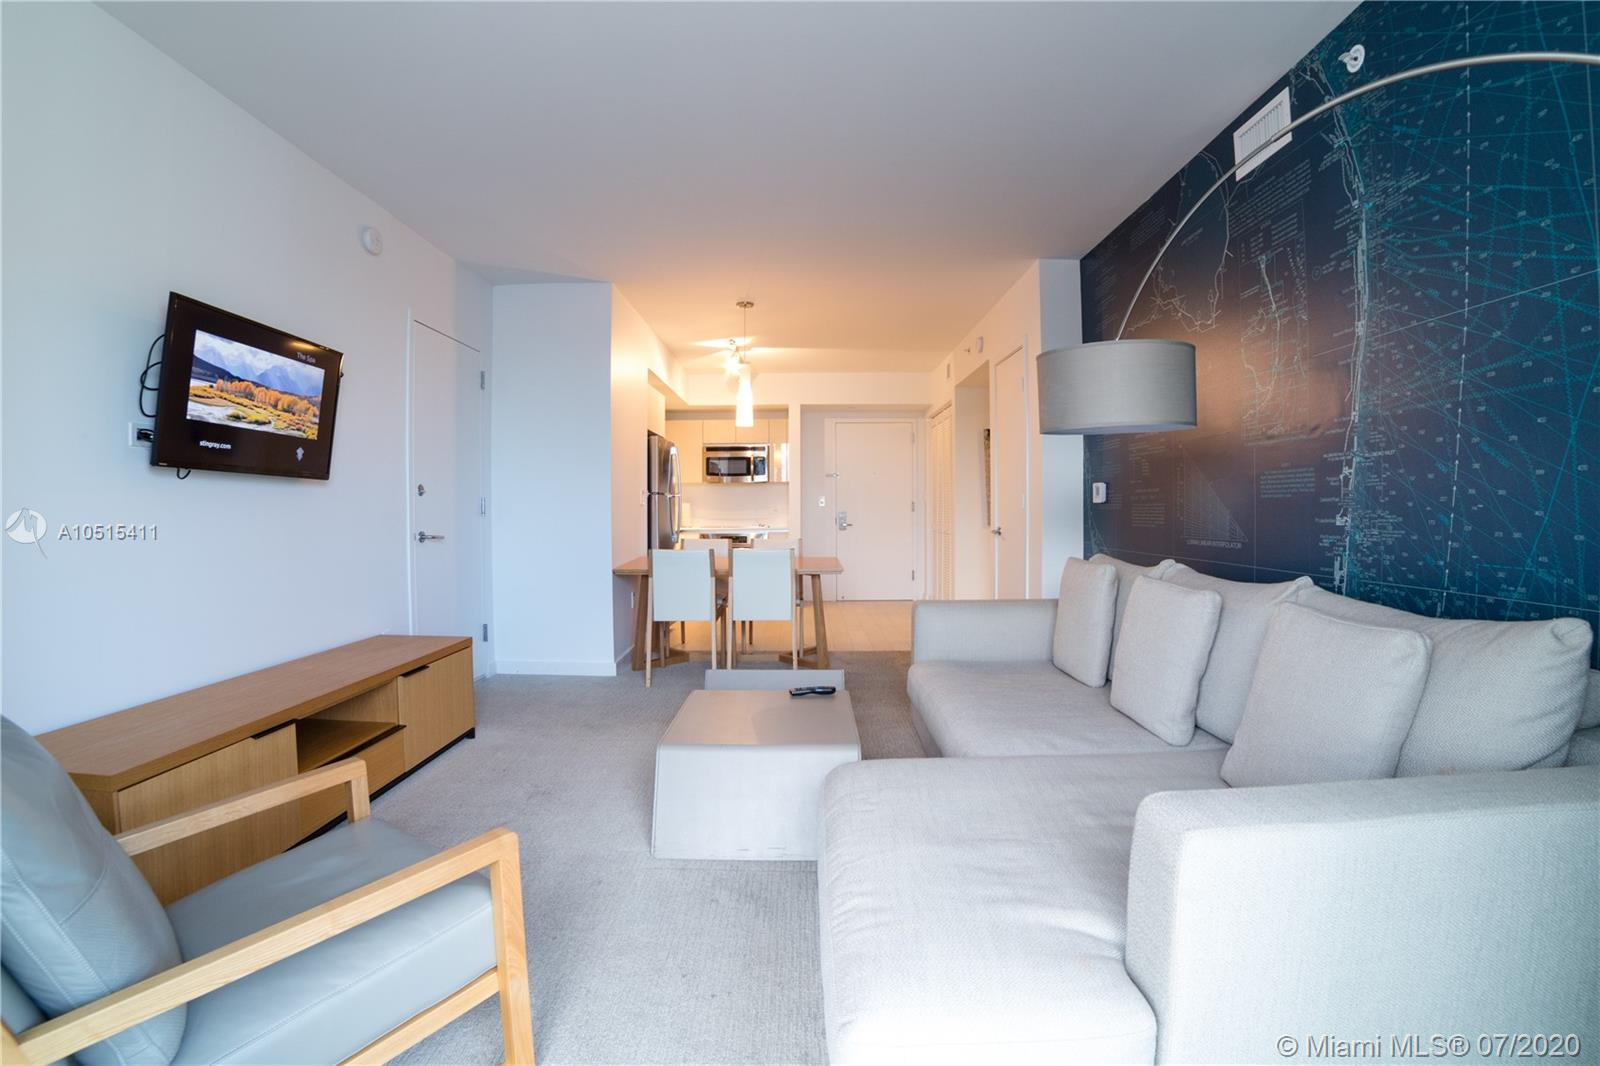 2602 E Hallandale Beach, Hallandale Beach, Florida 33009, 2 Bedrooms Bedrooms, ,2 BathroomsBathrooms,Rental,For Rent,2602 E Hallandale Beach,A10515411